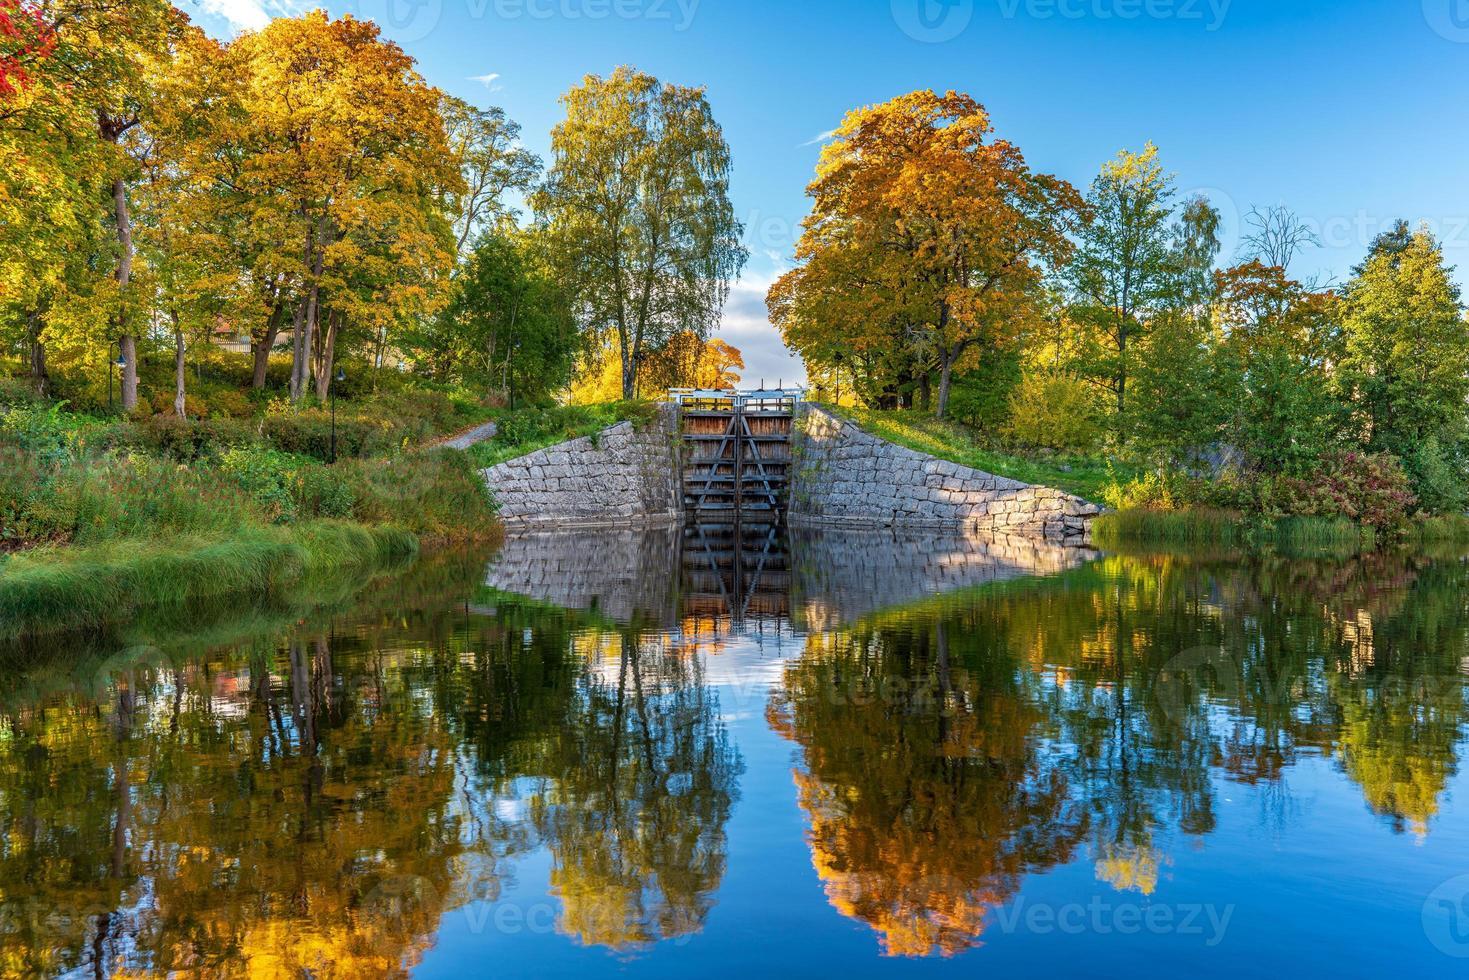 bella vista autunnale di una serratura in Svezia foto